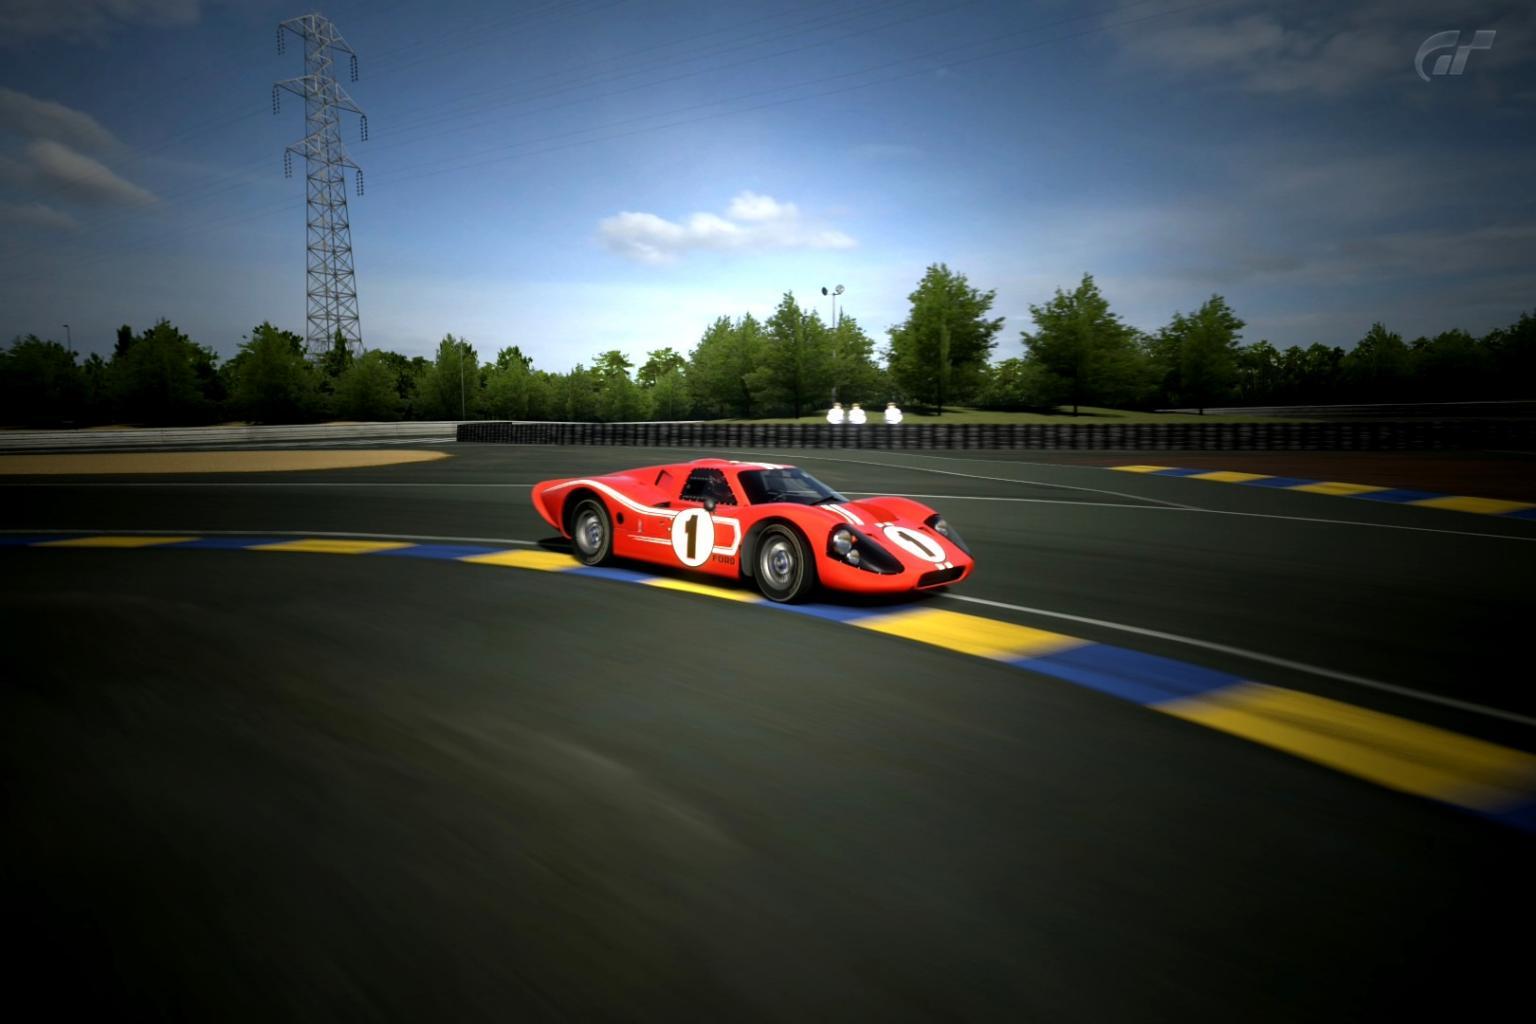 BigB's RCR MKIV-circuit-de-la-sarthe-2005-no-chicanes-_1-jpg